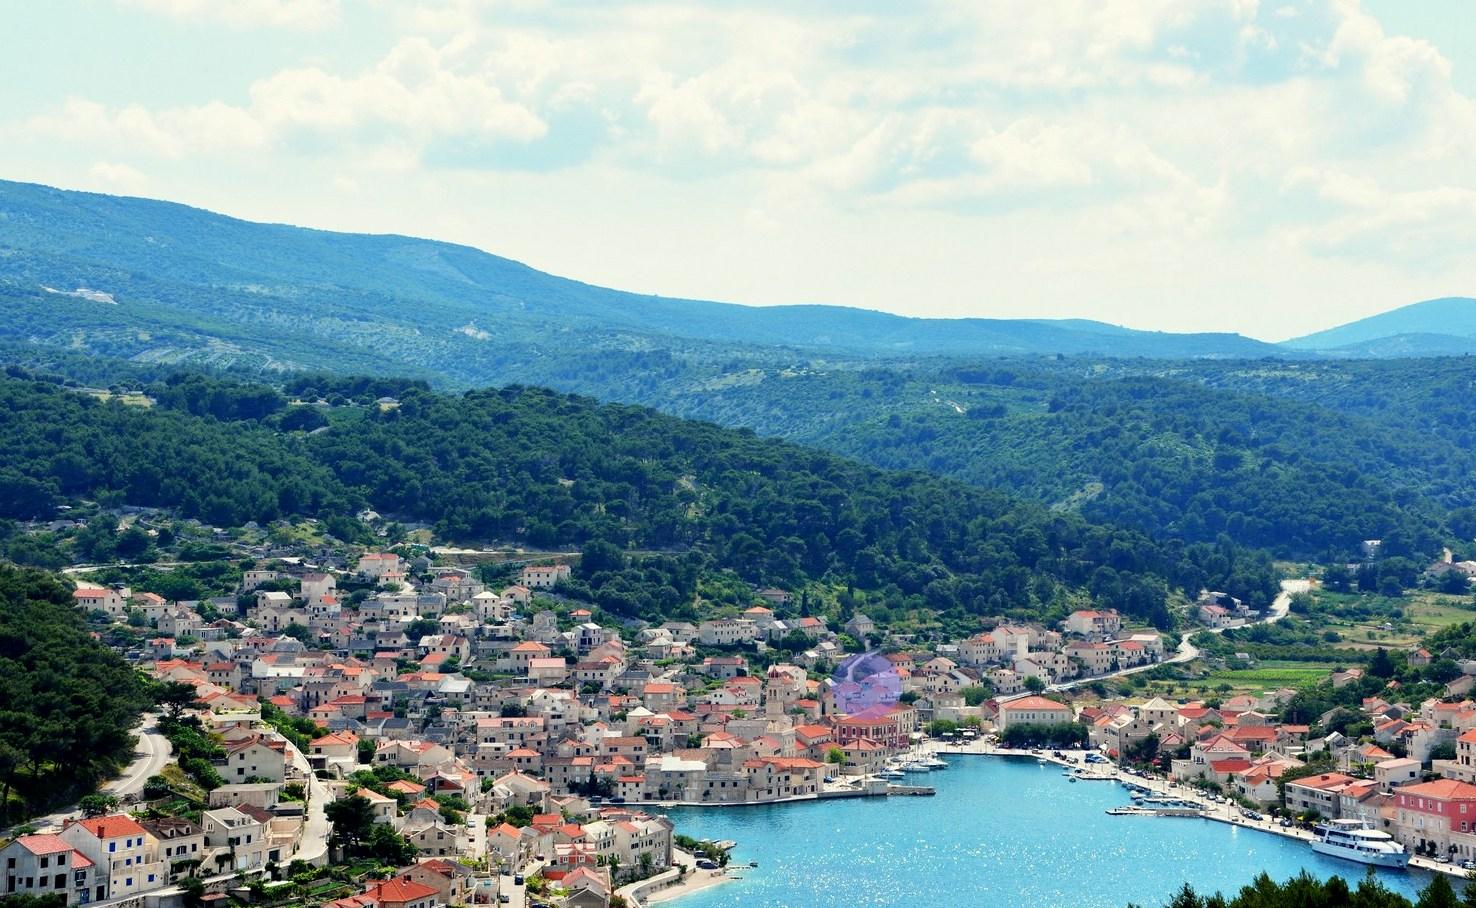 otok_brac_pucisca